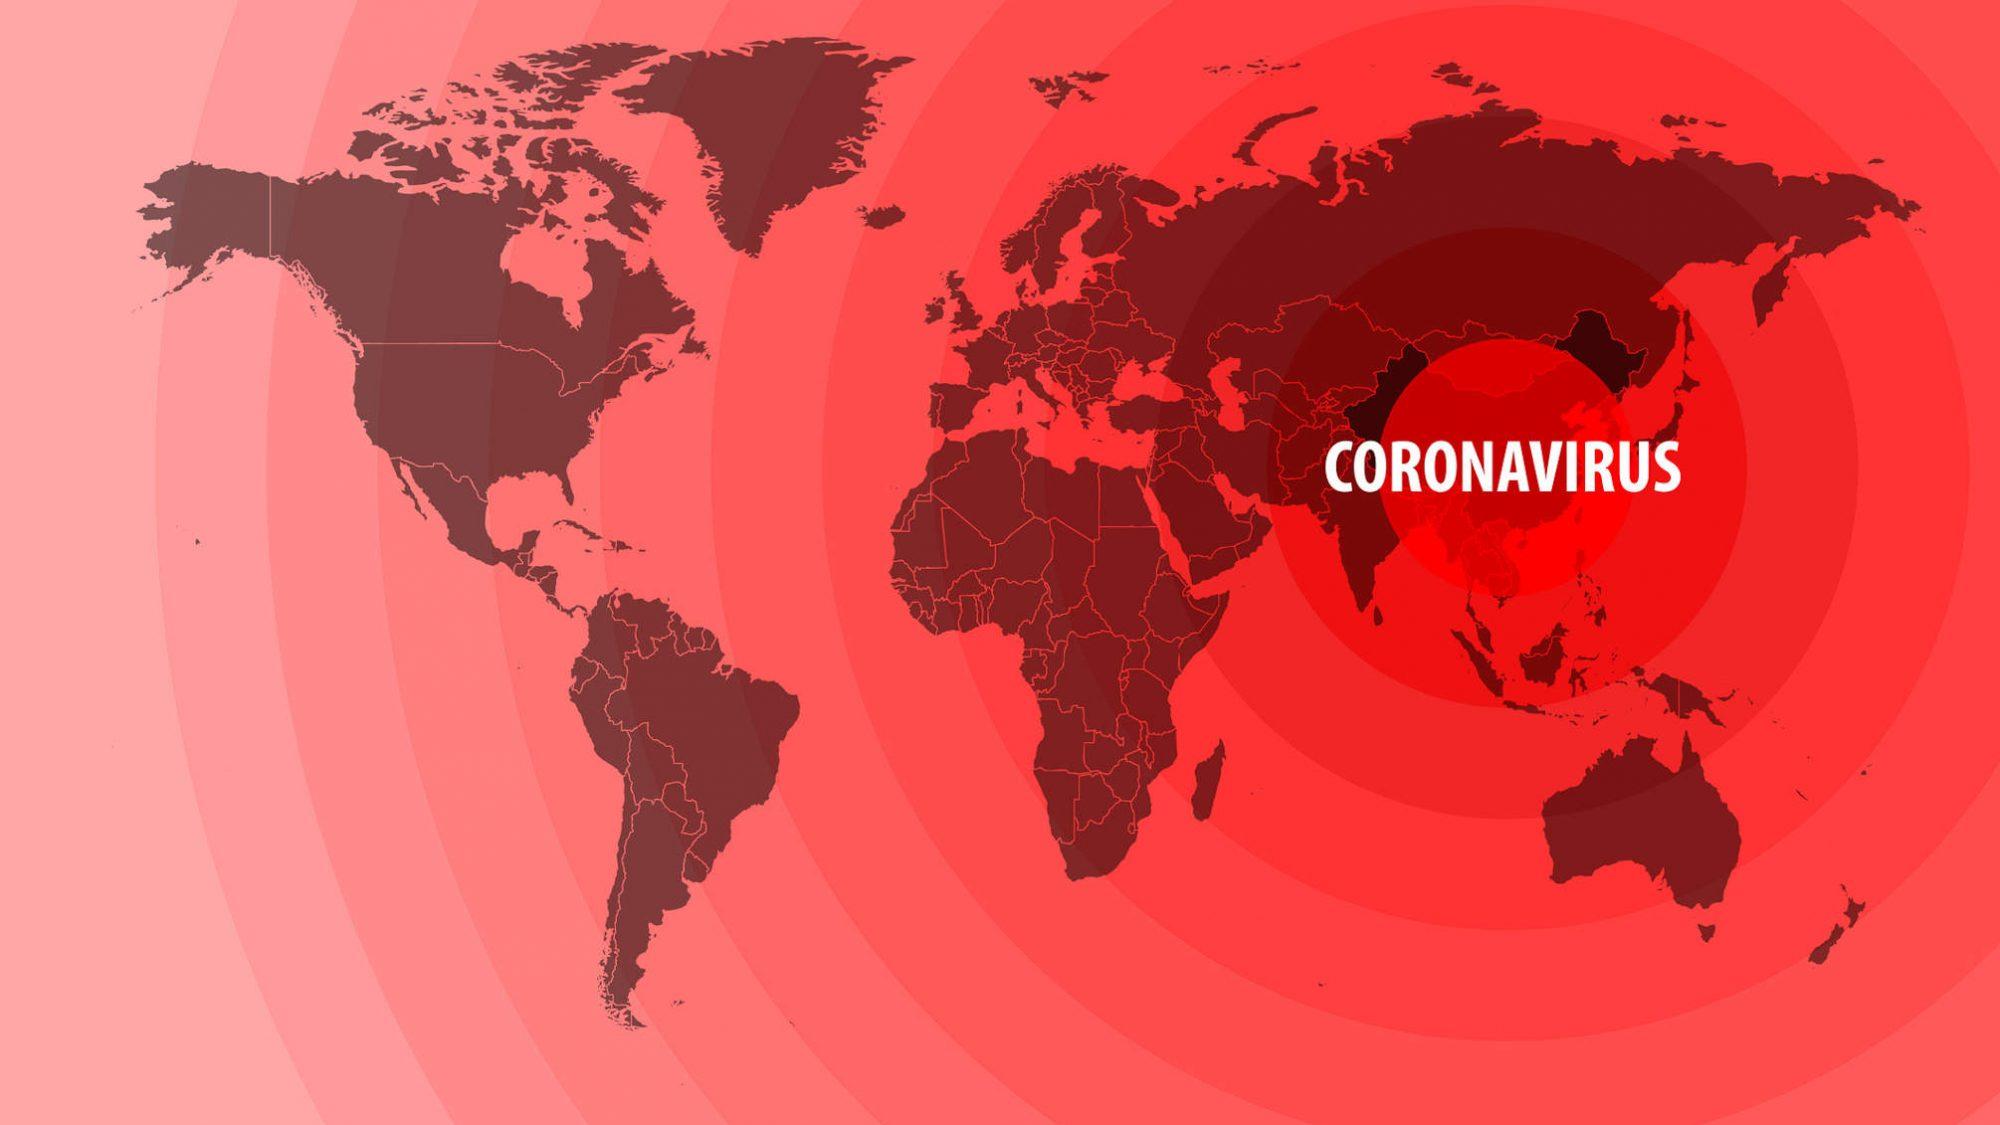 TS-CONFERENCE Corona News